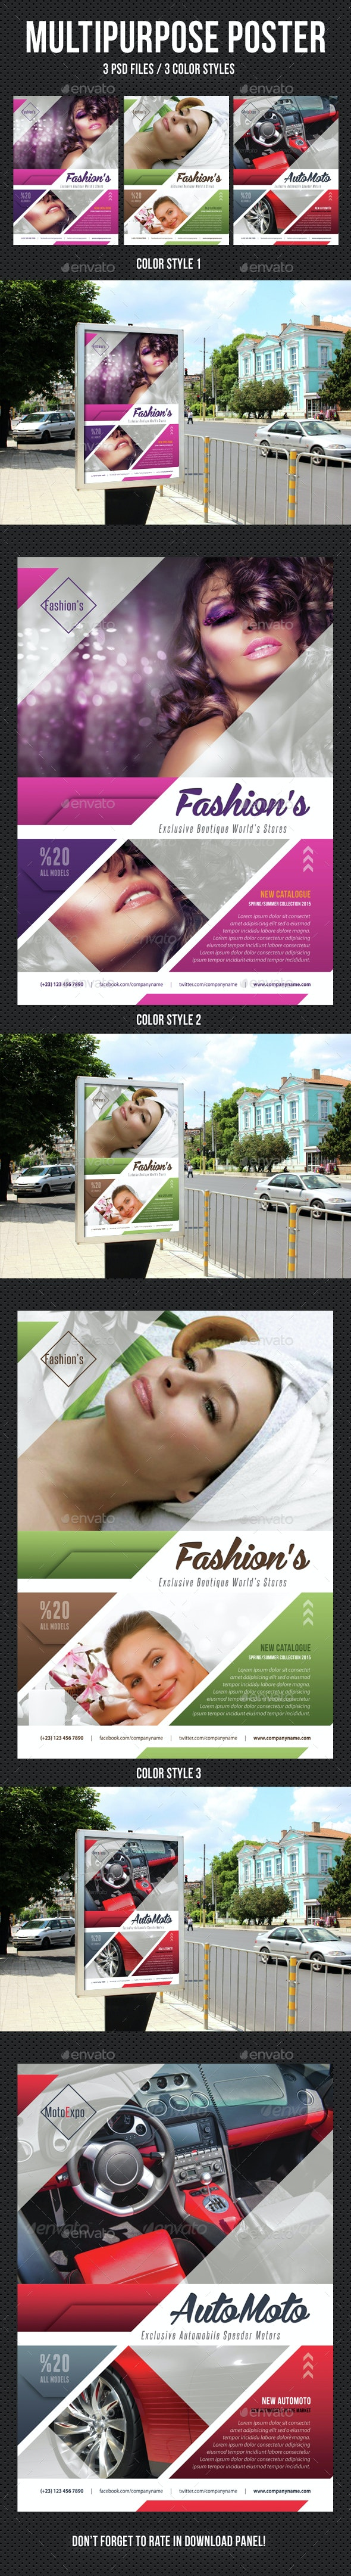 Multipurpose Flexible Poster 01 - Signage Print Templates